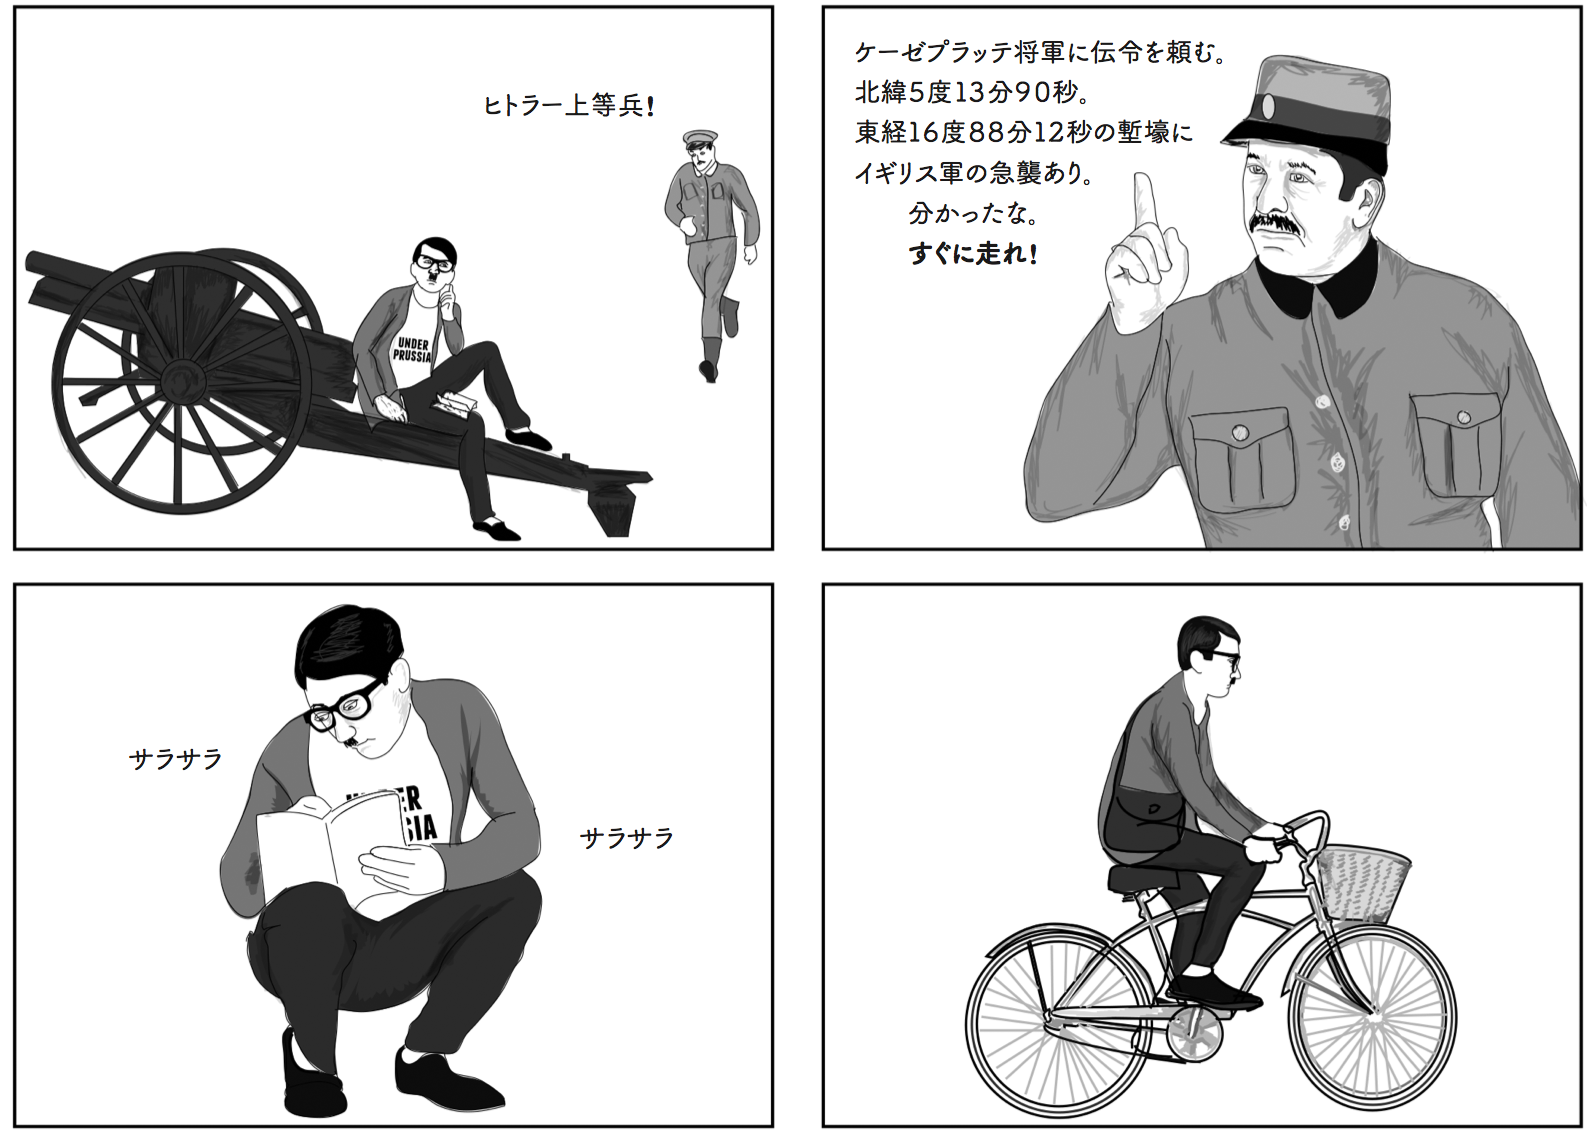 hipster hitler japanese translation